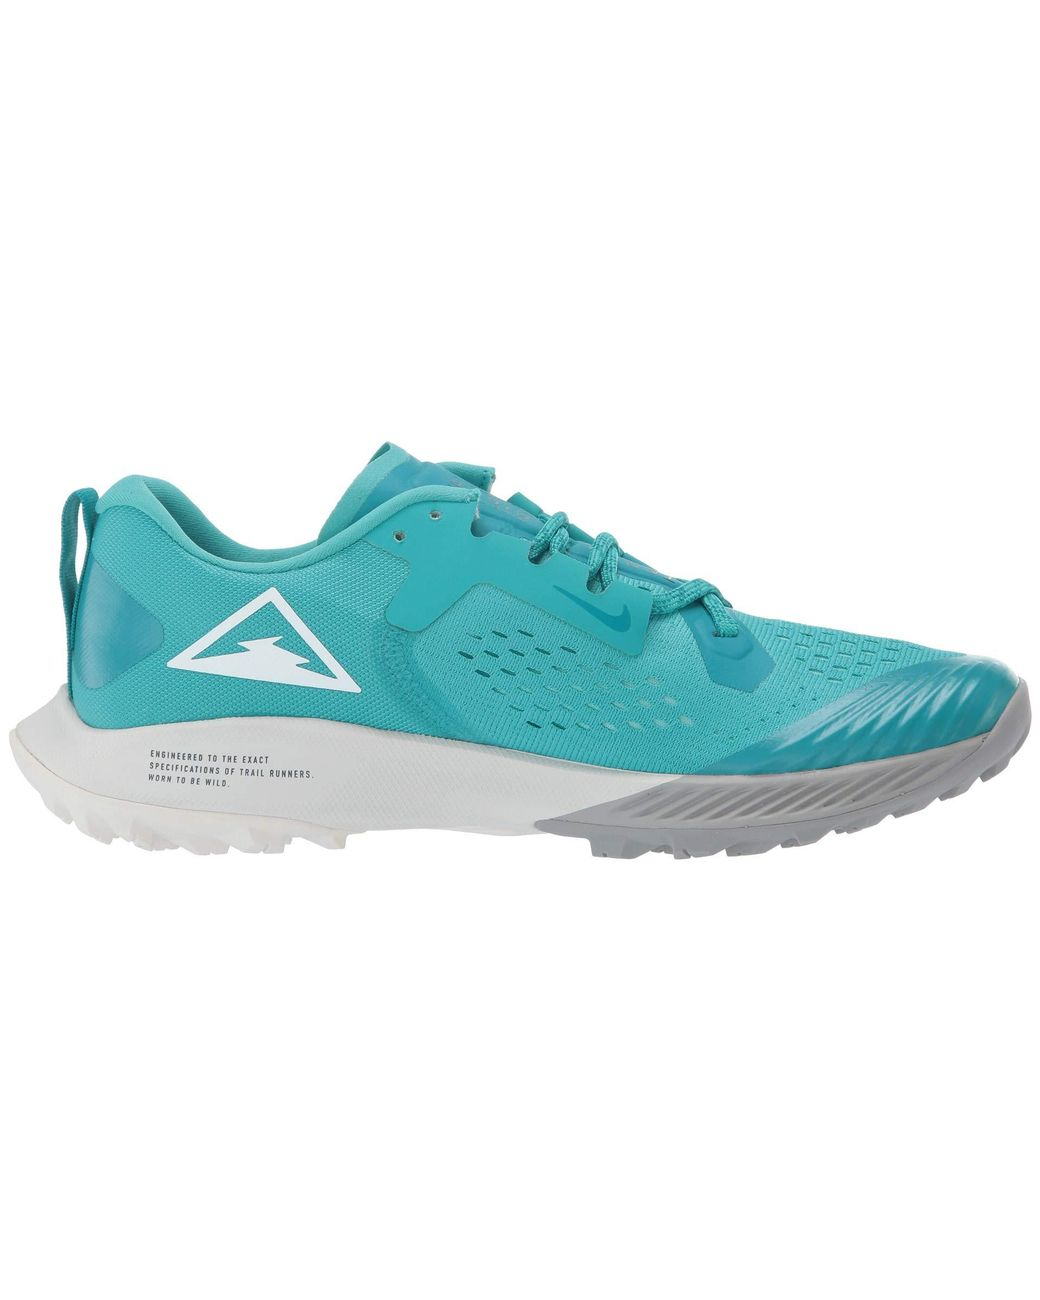 6d8fde4fb56 Lyst - Nike Air Zoom Terra Kiger 5 (black barely Grey gunsmoke wolf Grey)  Women s Running Shoes in Blue